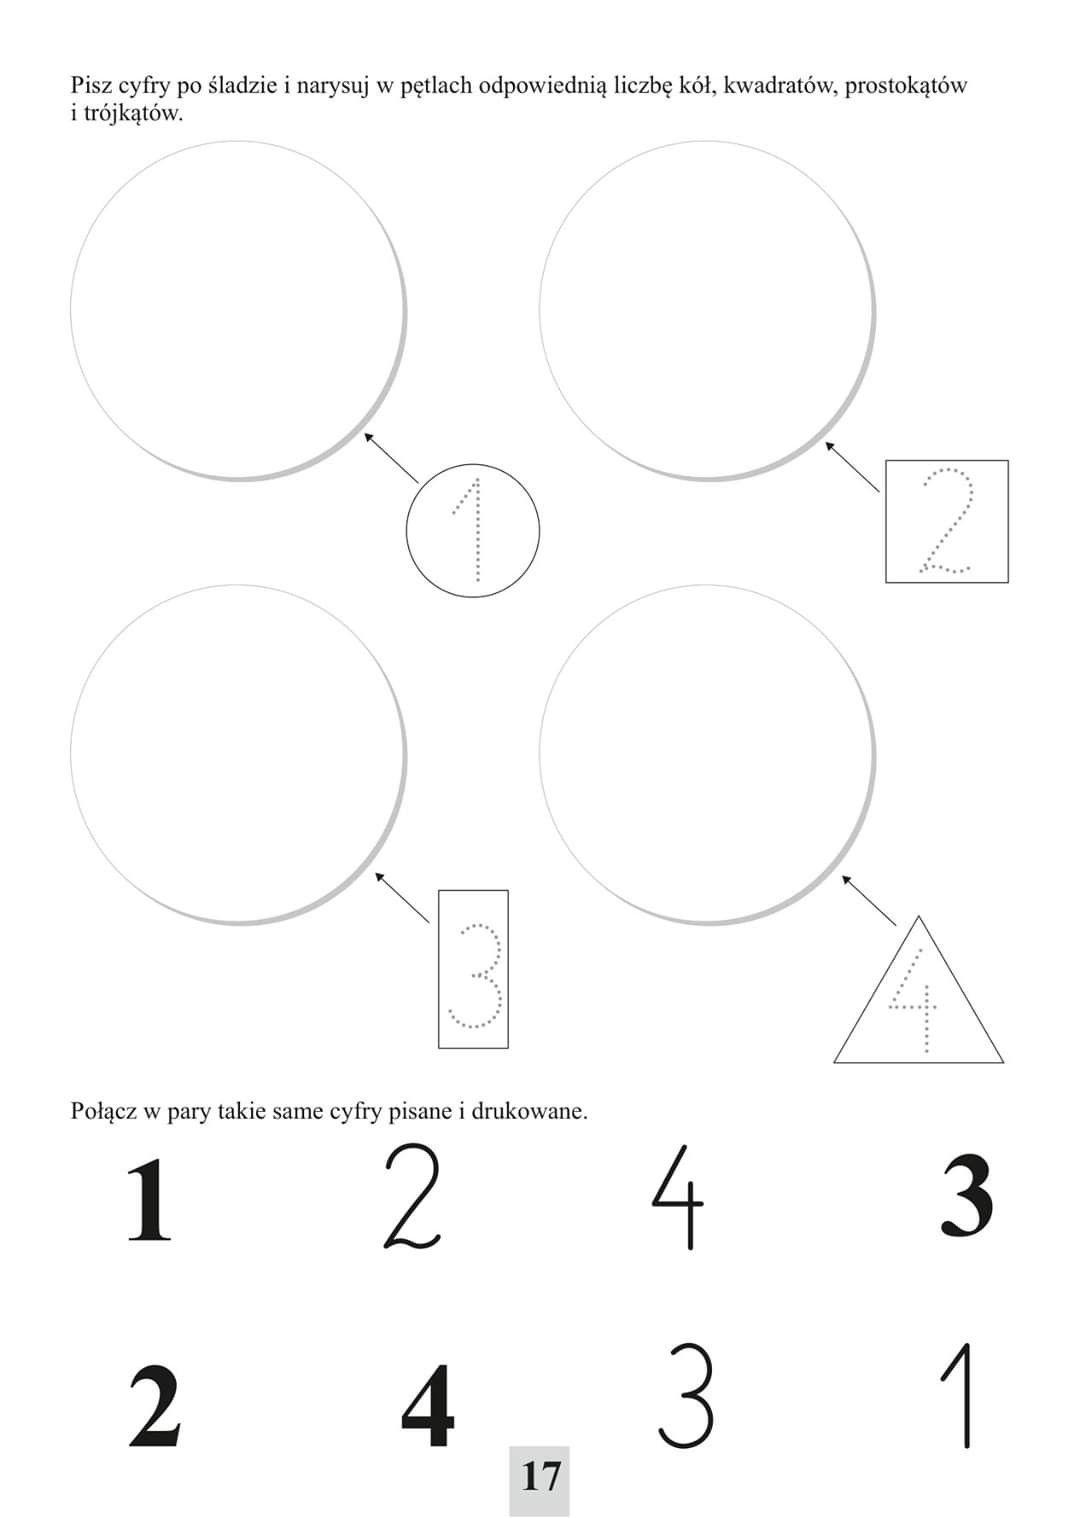 Pin By Ewa Jaszczak On Dzieci Ca Matematyka In